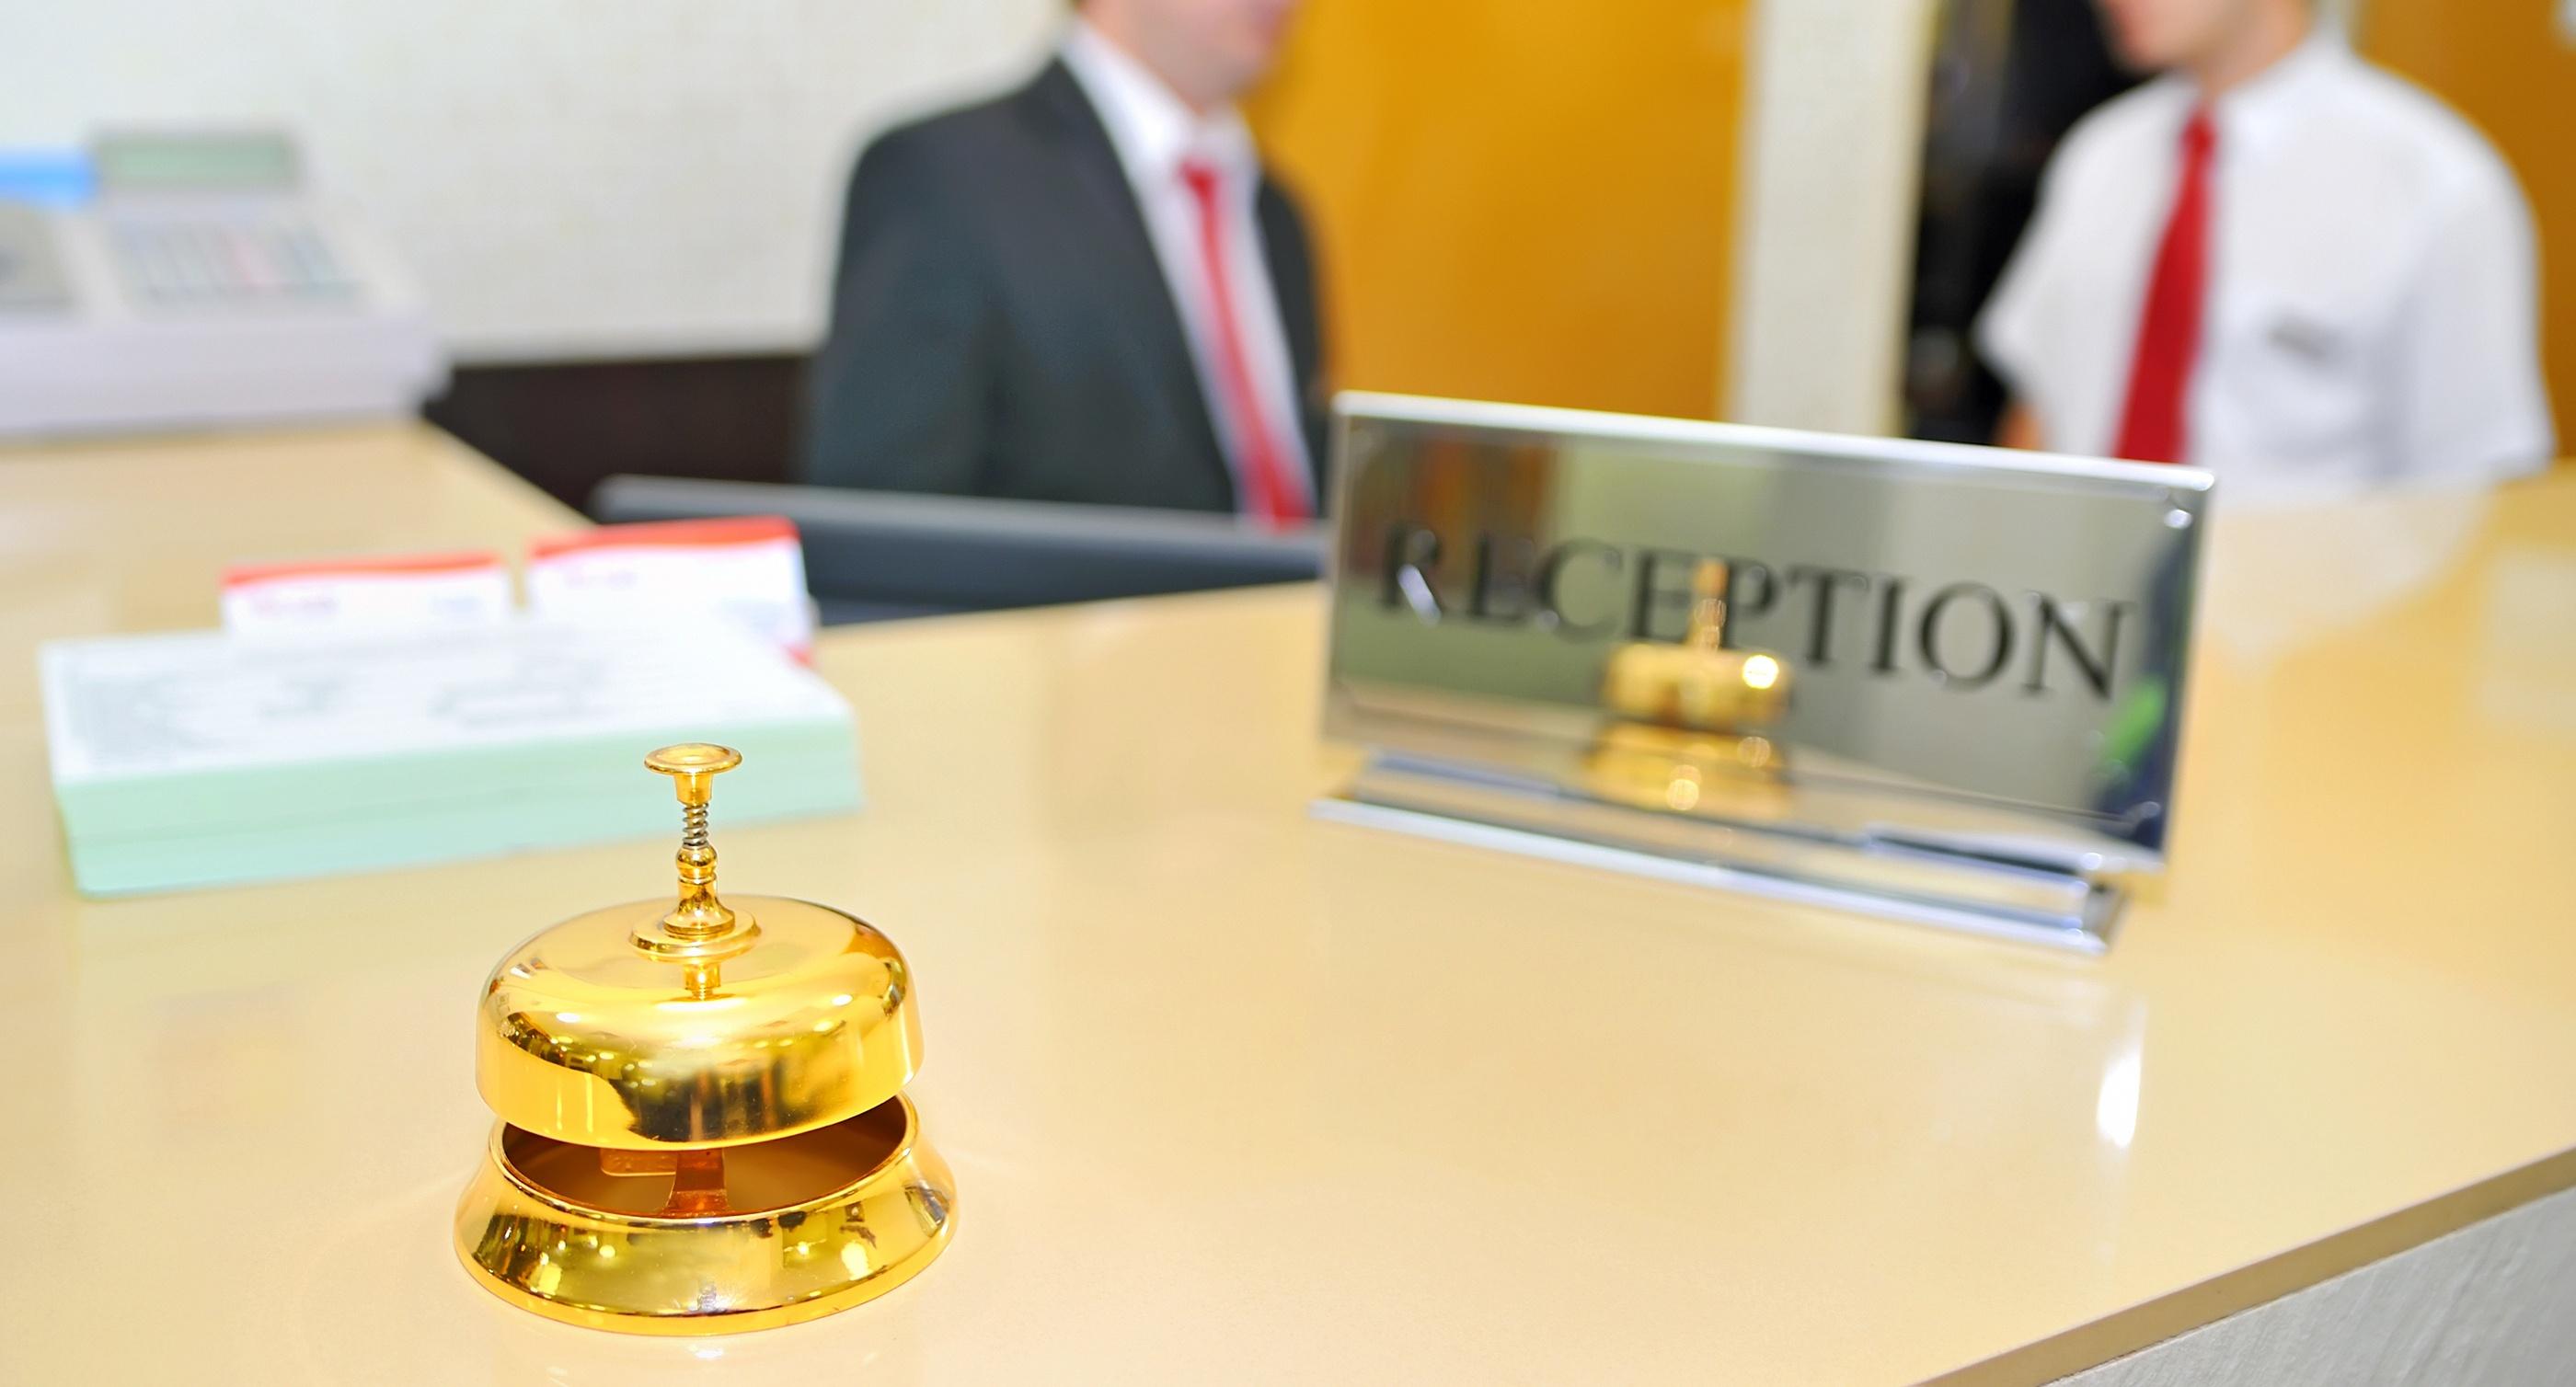 bigstock-bell-on-hotel-reception-9980273.jpg